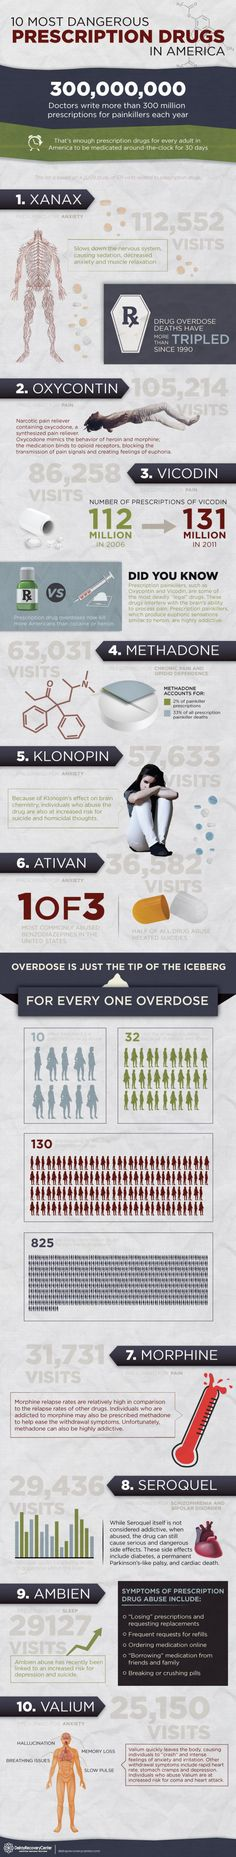 10 Most Dangerous Prescription Drugs Infographic - delrayrecoverycenter.com